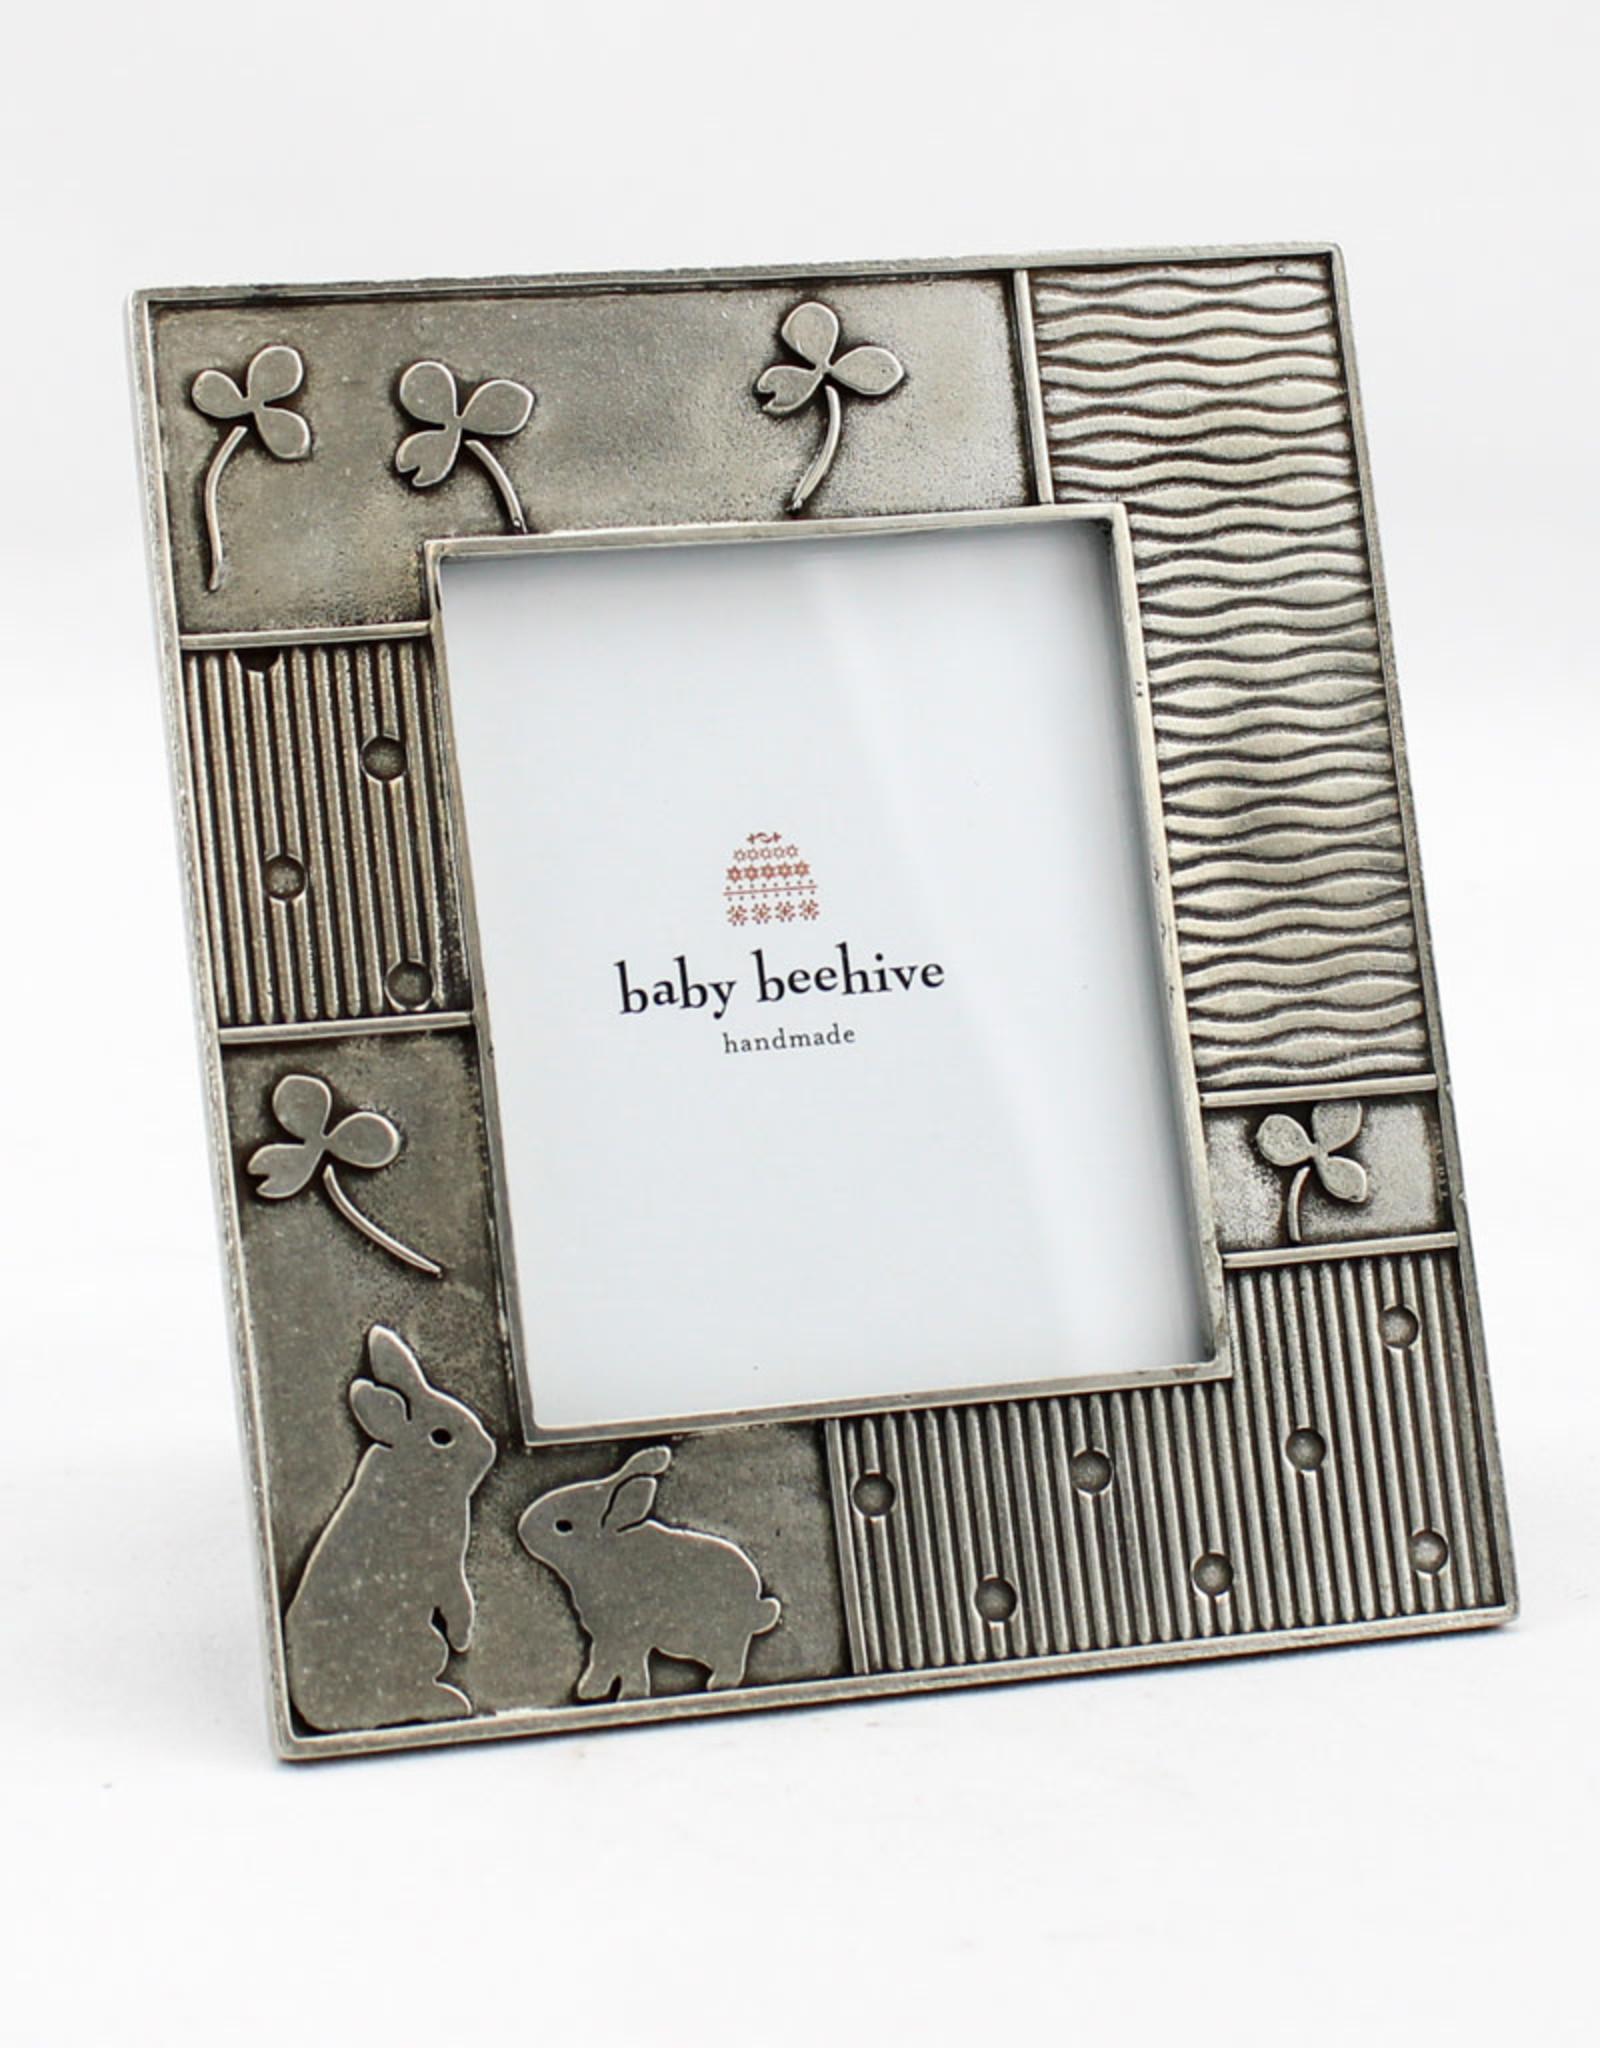 Beehive Handmade Rabbit Picture Frame